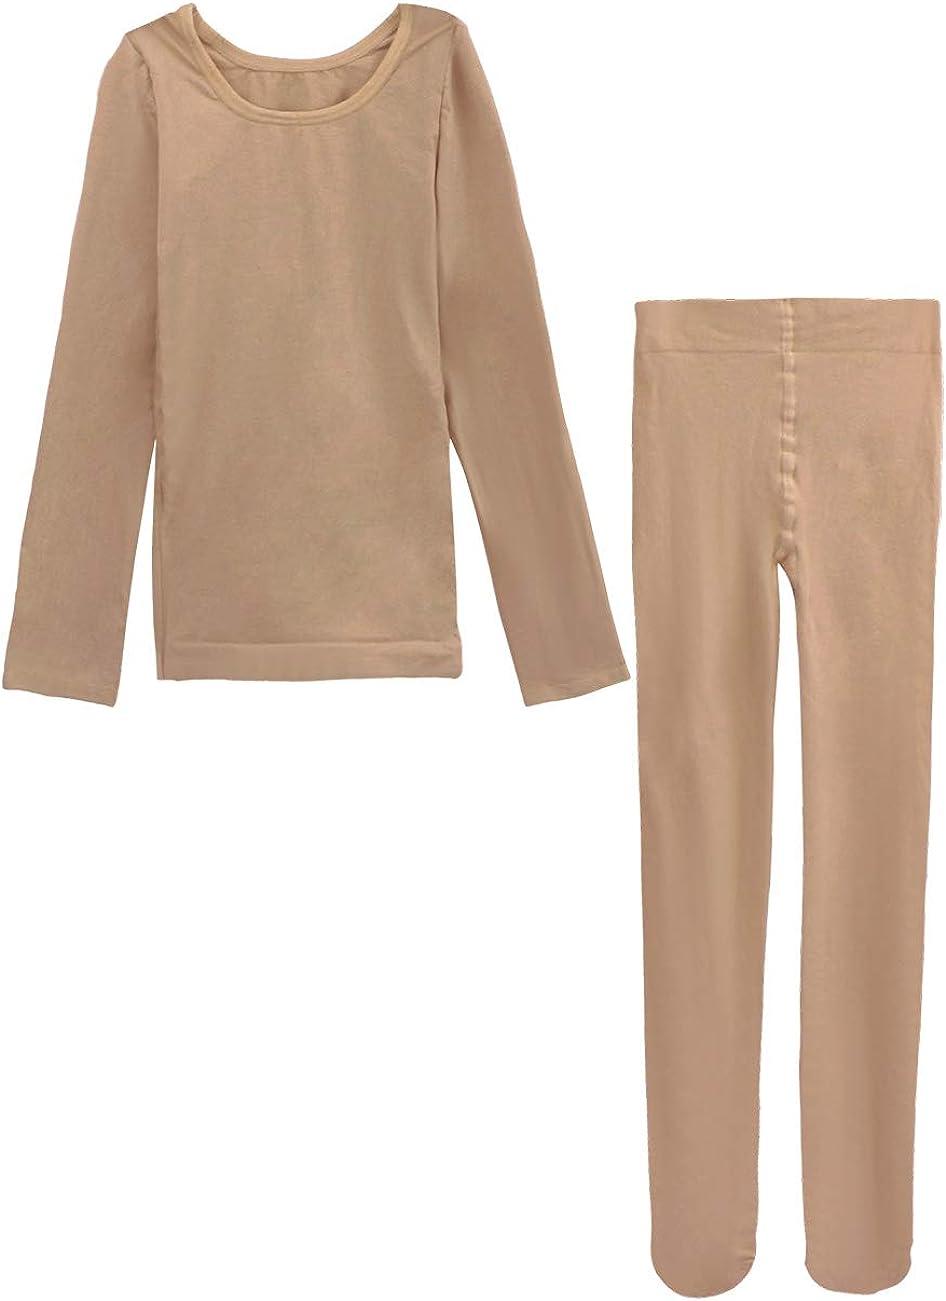 Amazon.com: Daydance Kids Girls Base Layers Set Tan Active Undergarments  for Dance: Clothing